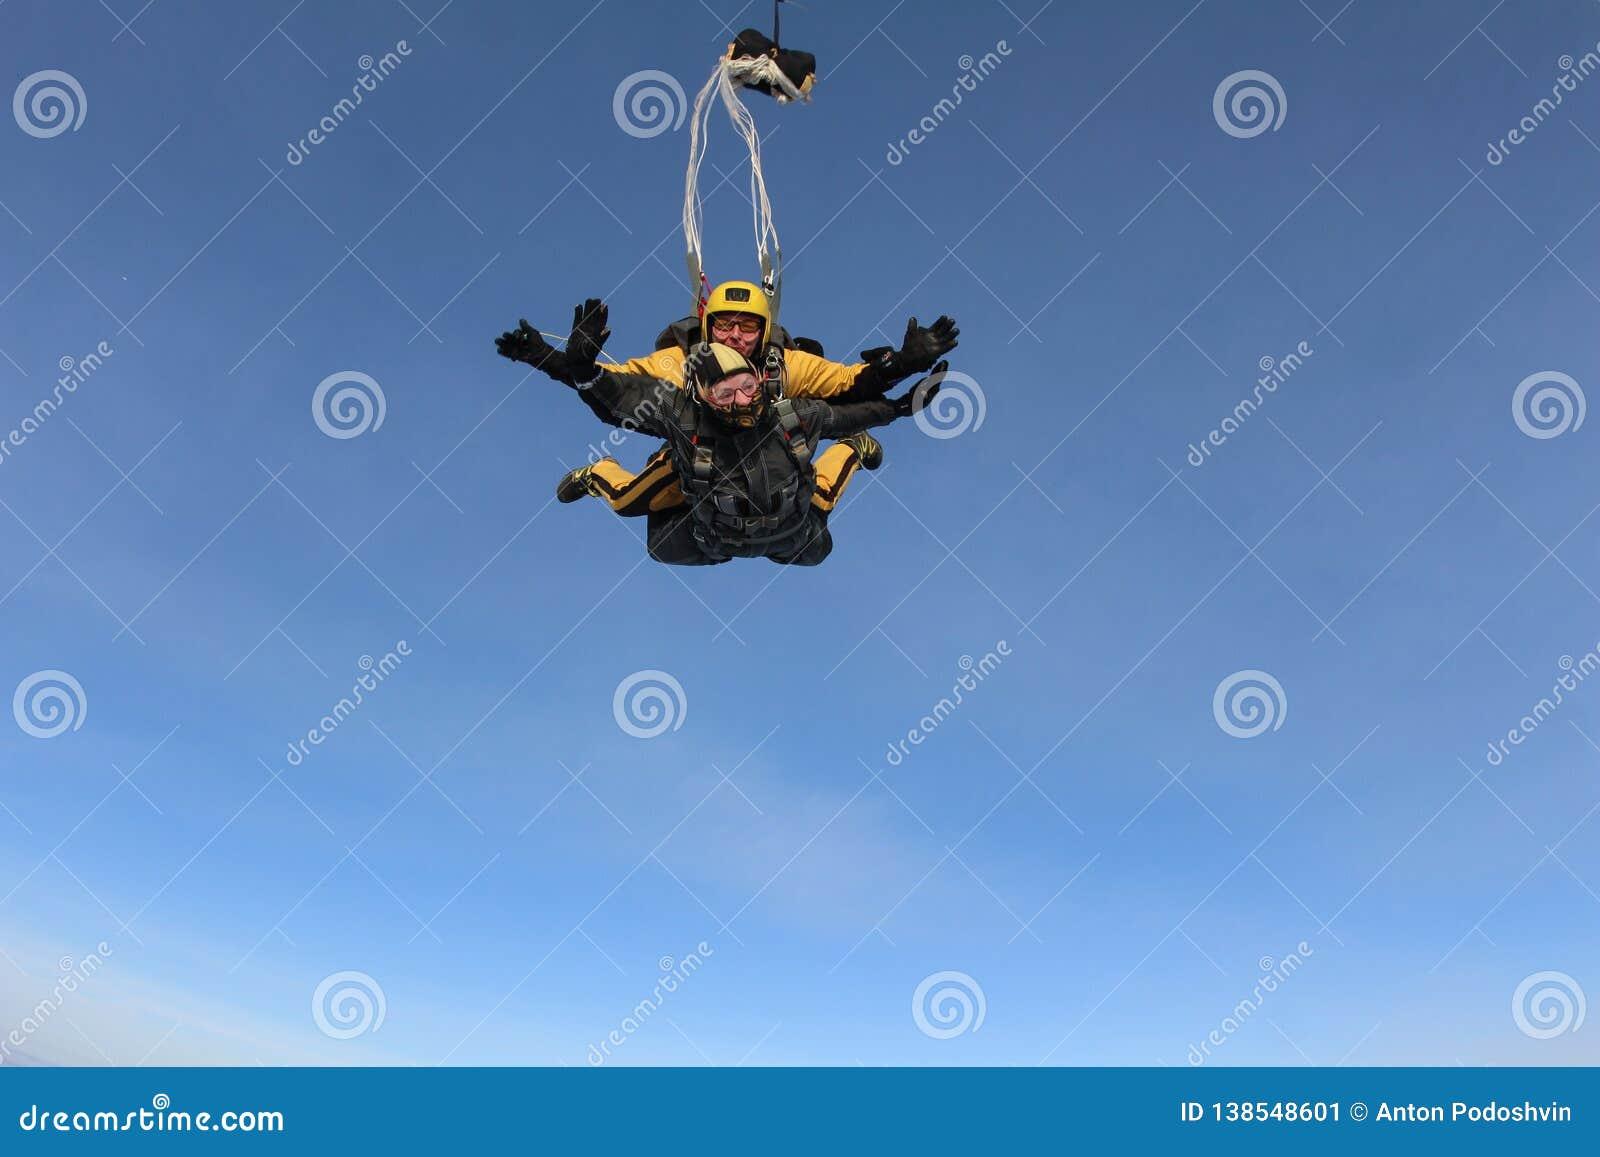 Tandemowy skydiving Skydivers latają nad białe chmury